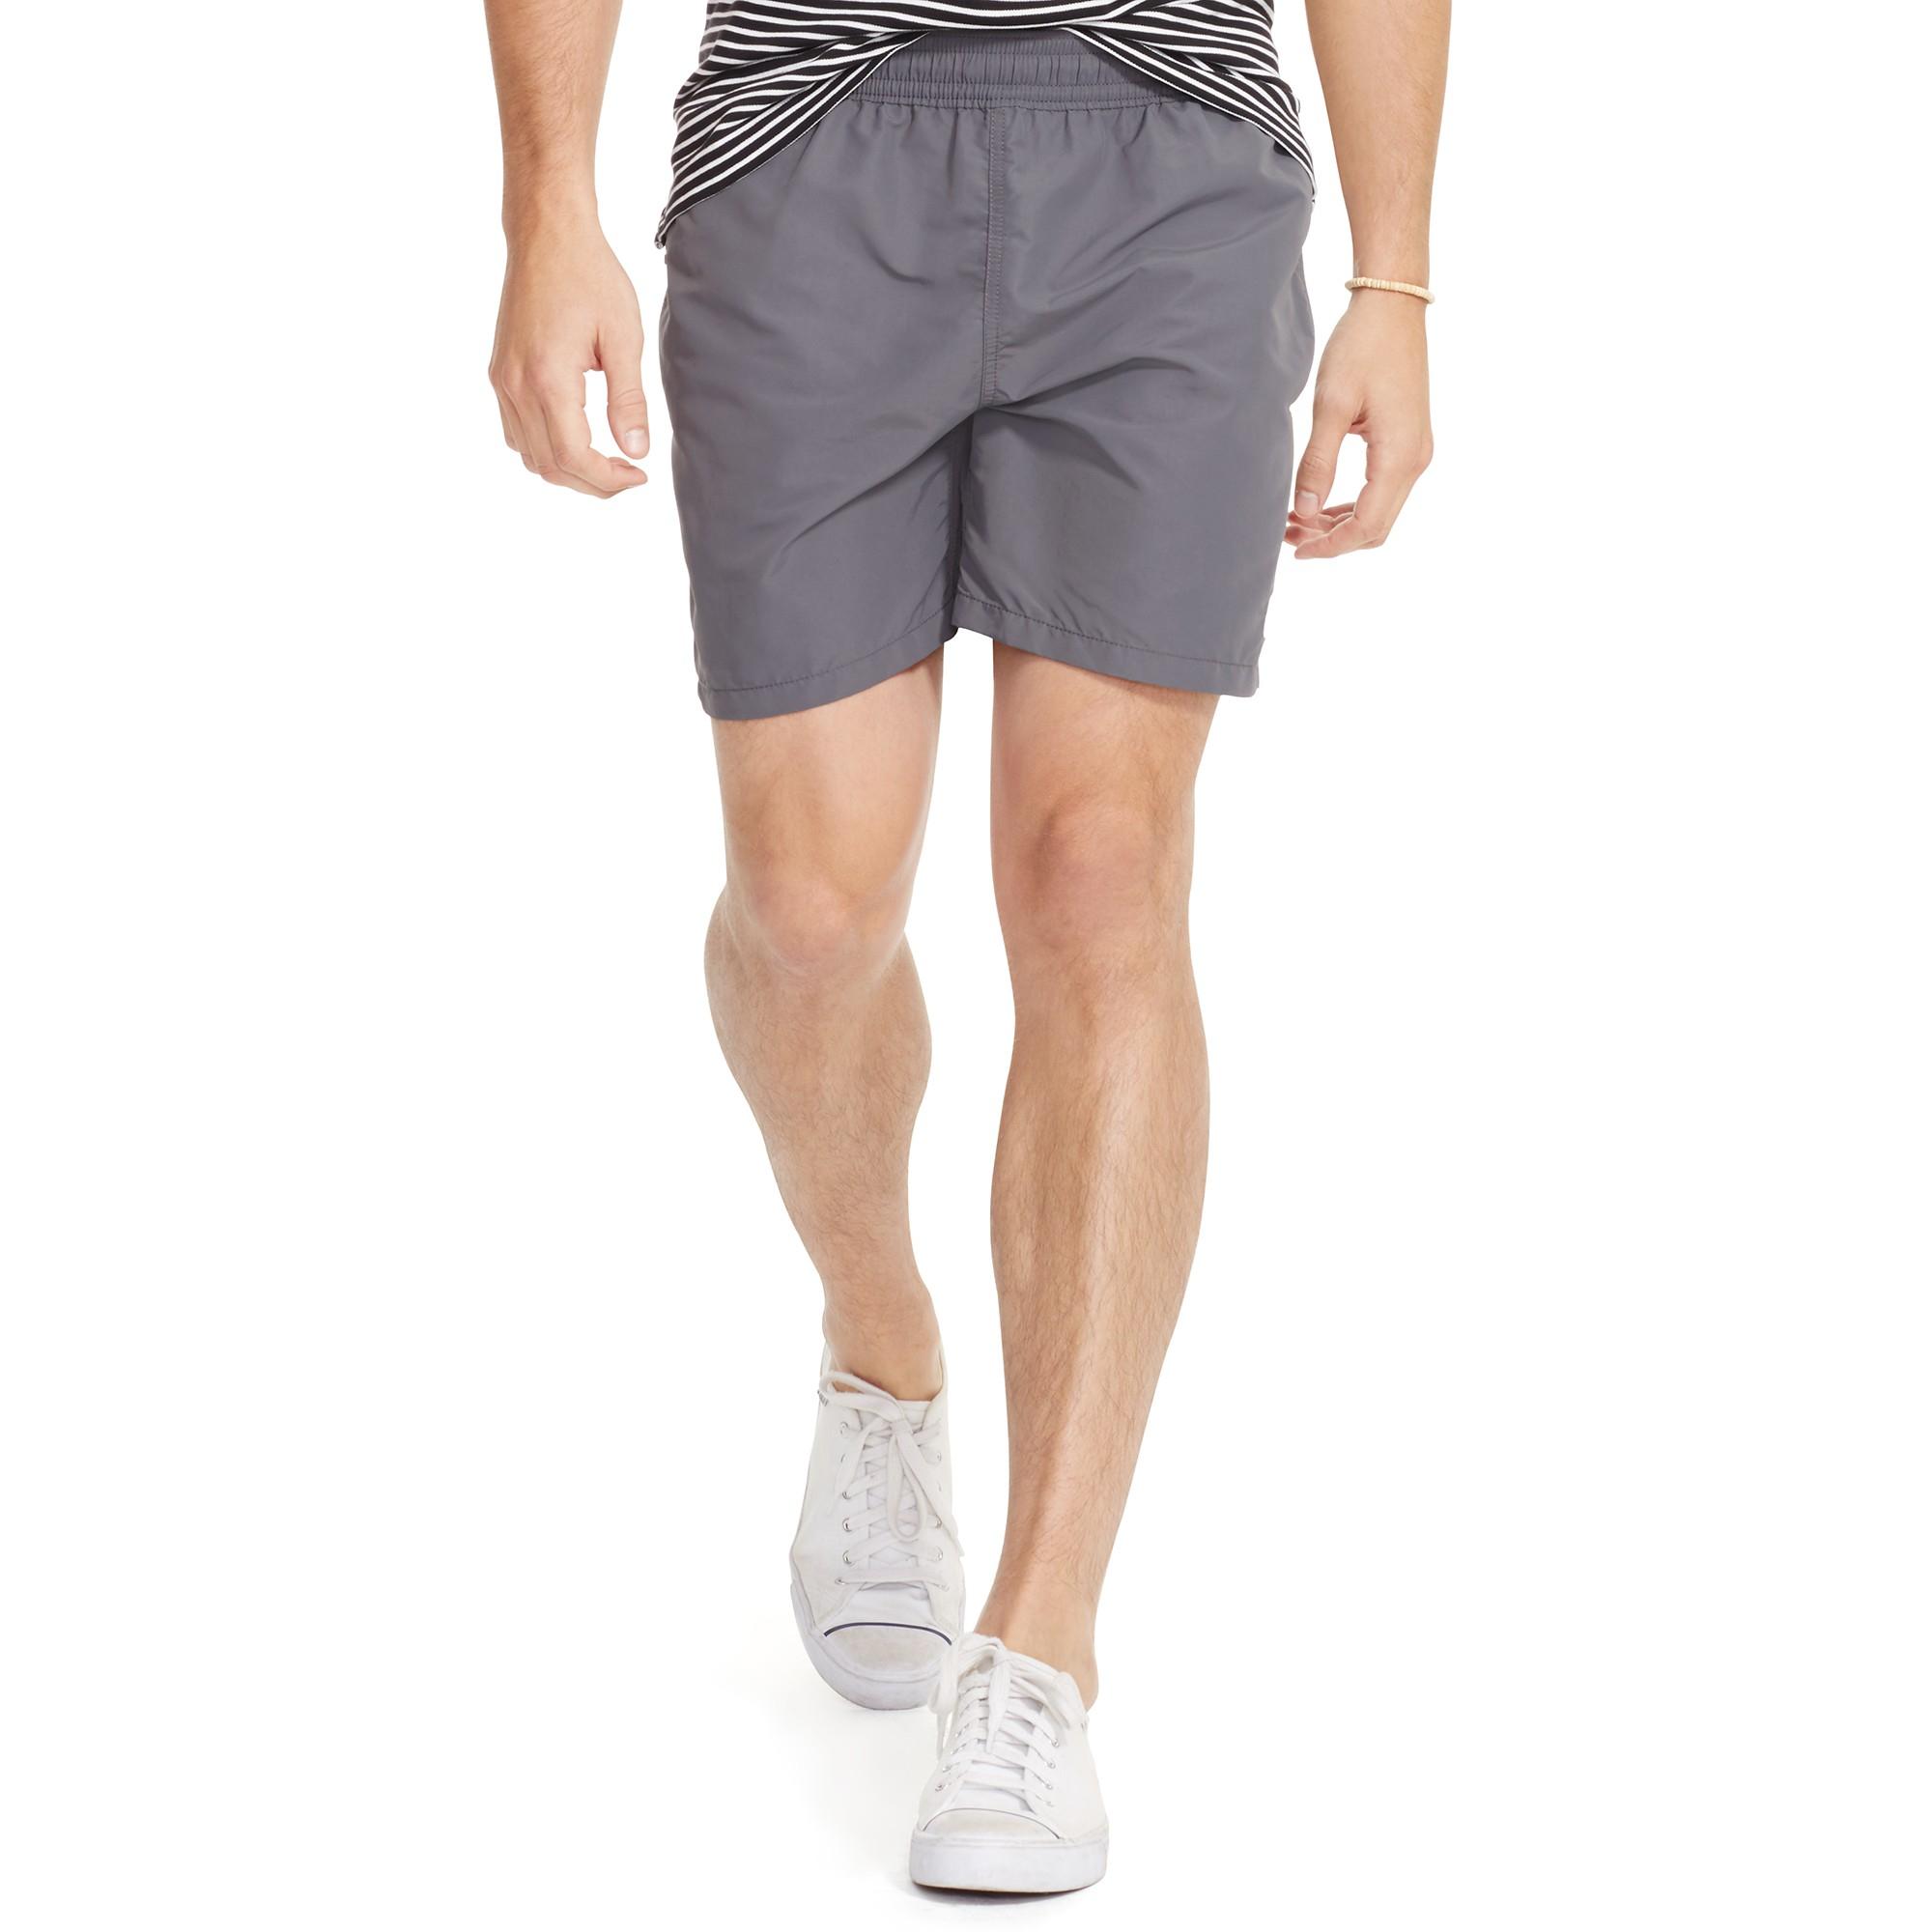 85bf1f62bb ... cheapest ralph lauren hawaiian swim shorts in gray for men lyst 6b956  dc4f1